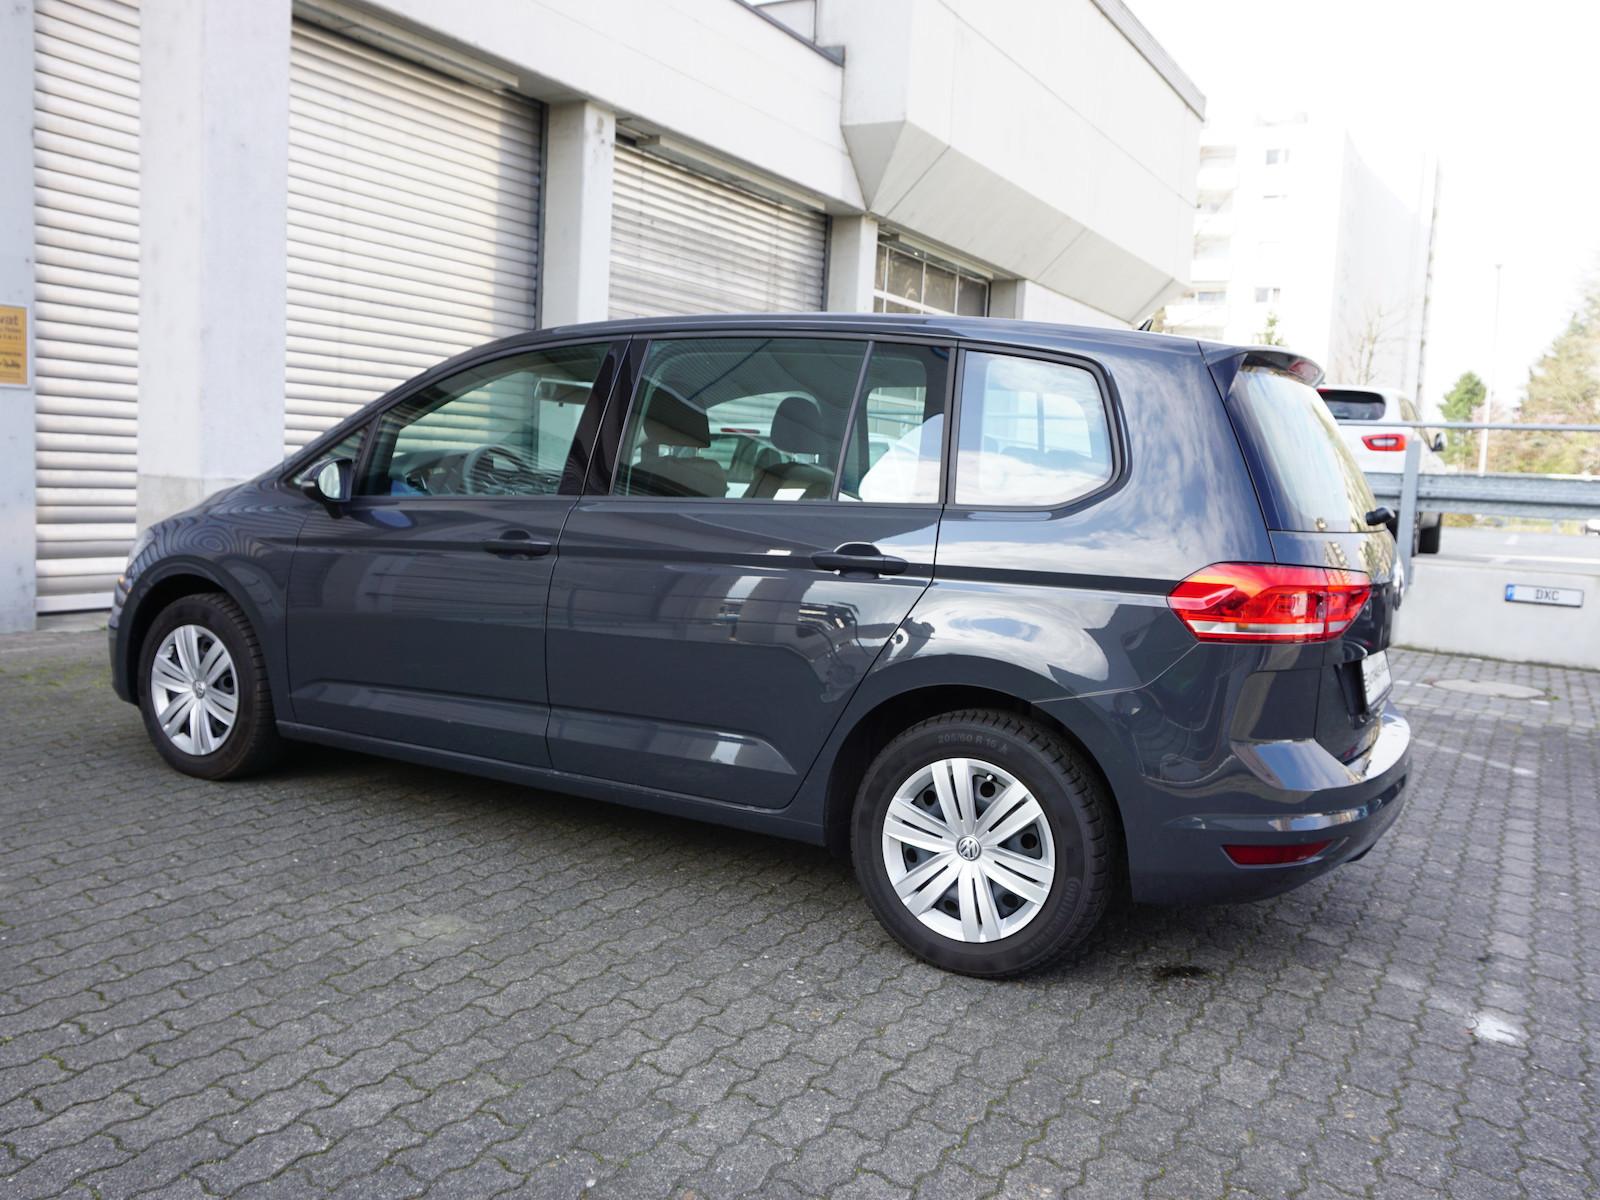 VW_Touran__10